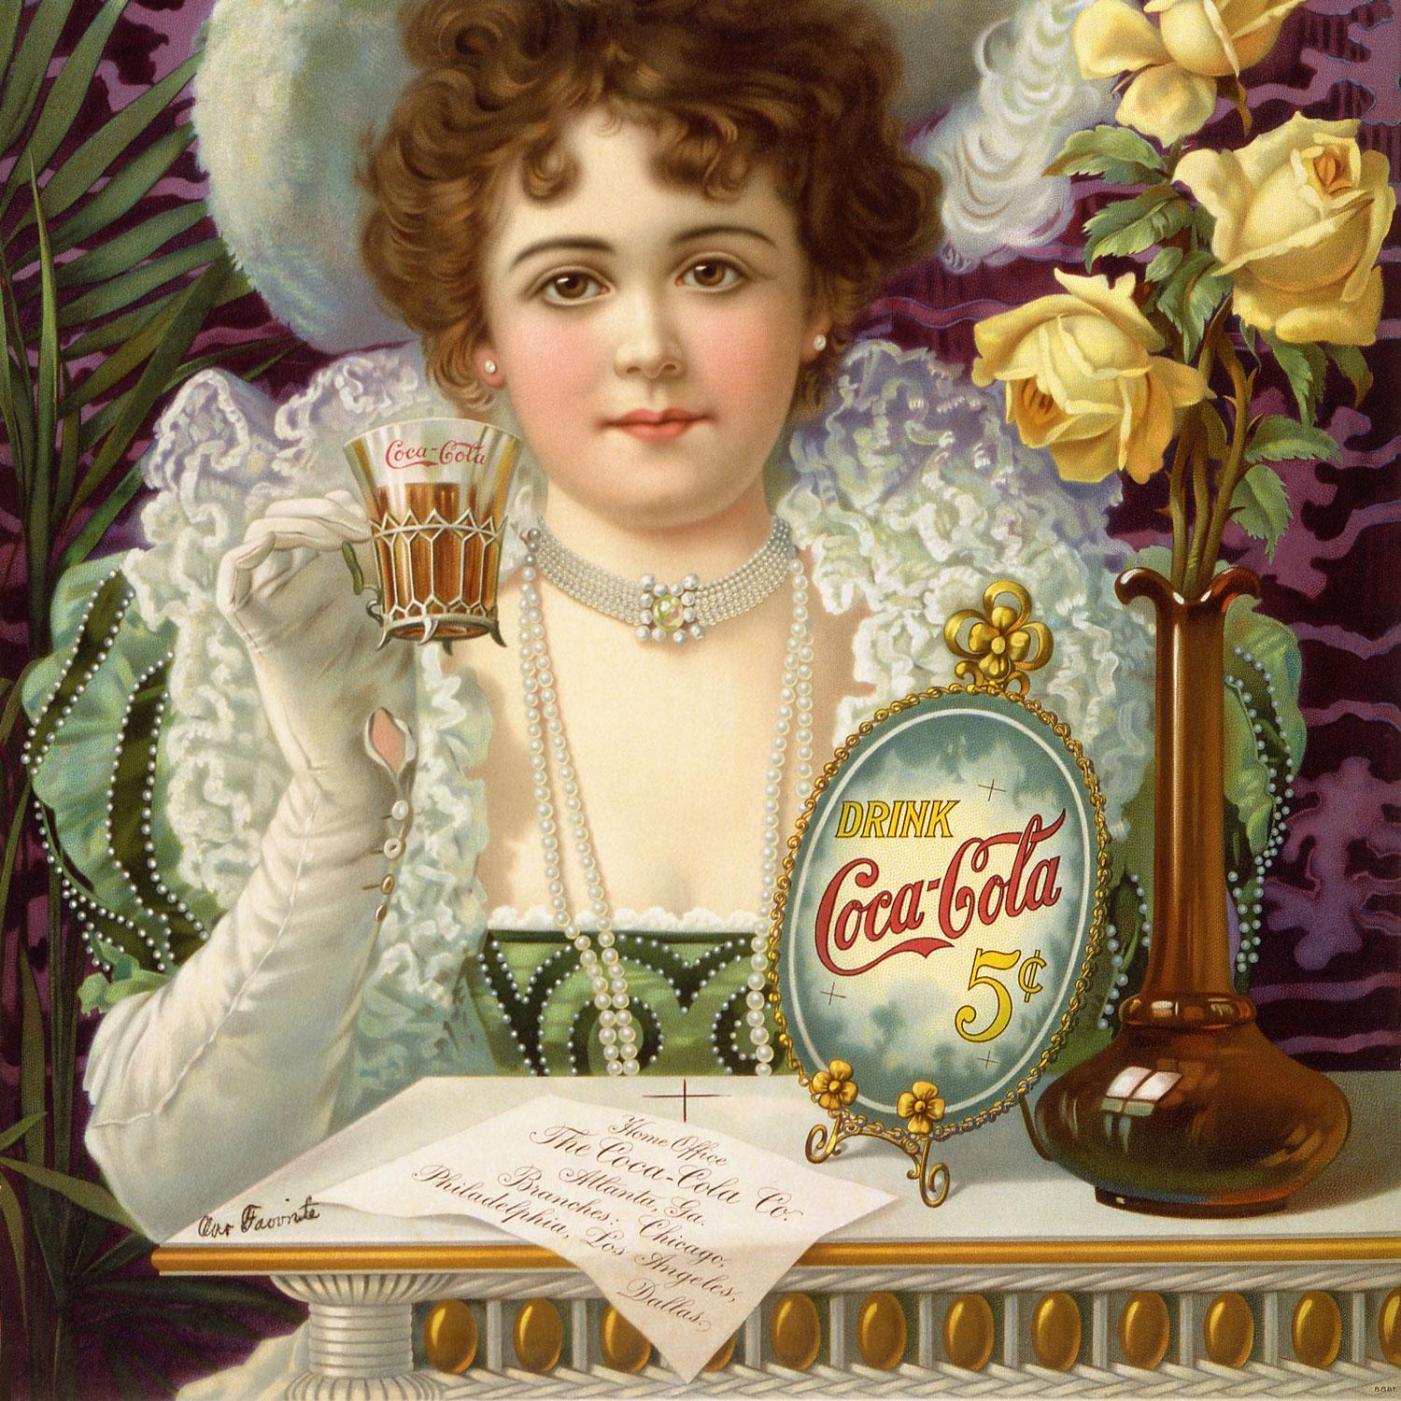 Cocacola-5cents-1900_edit1.jpg